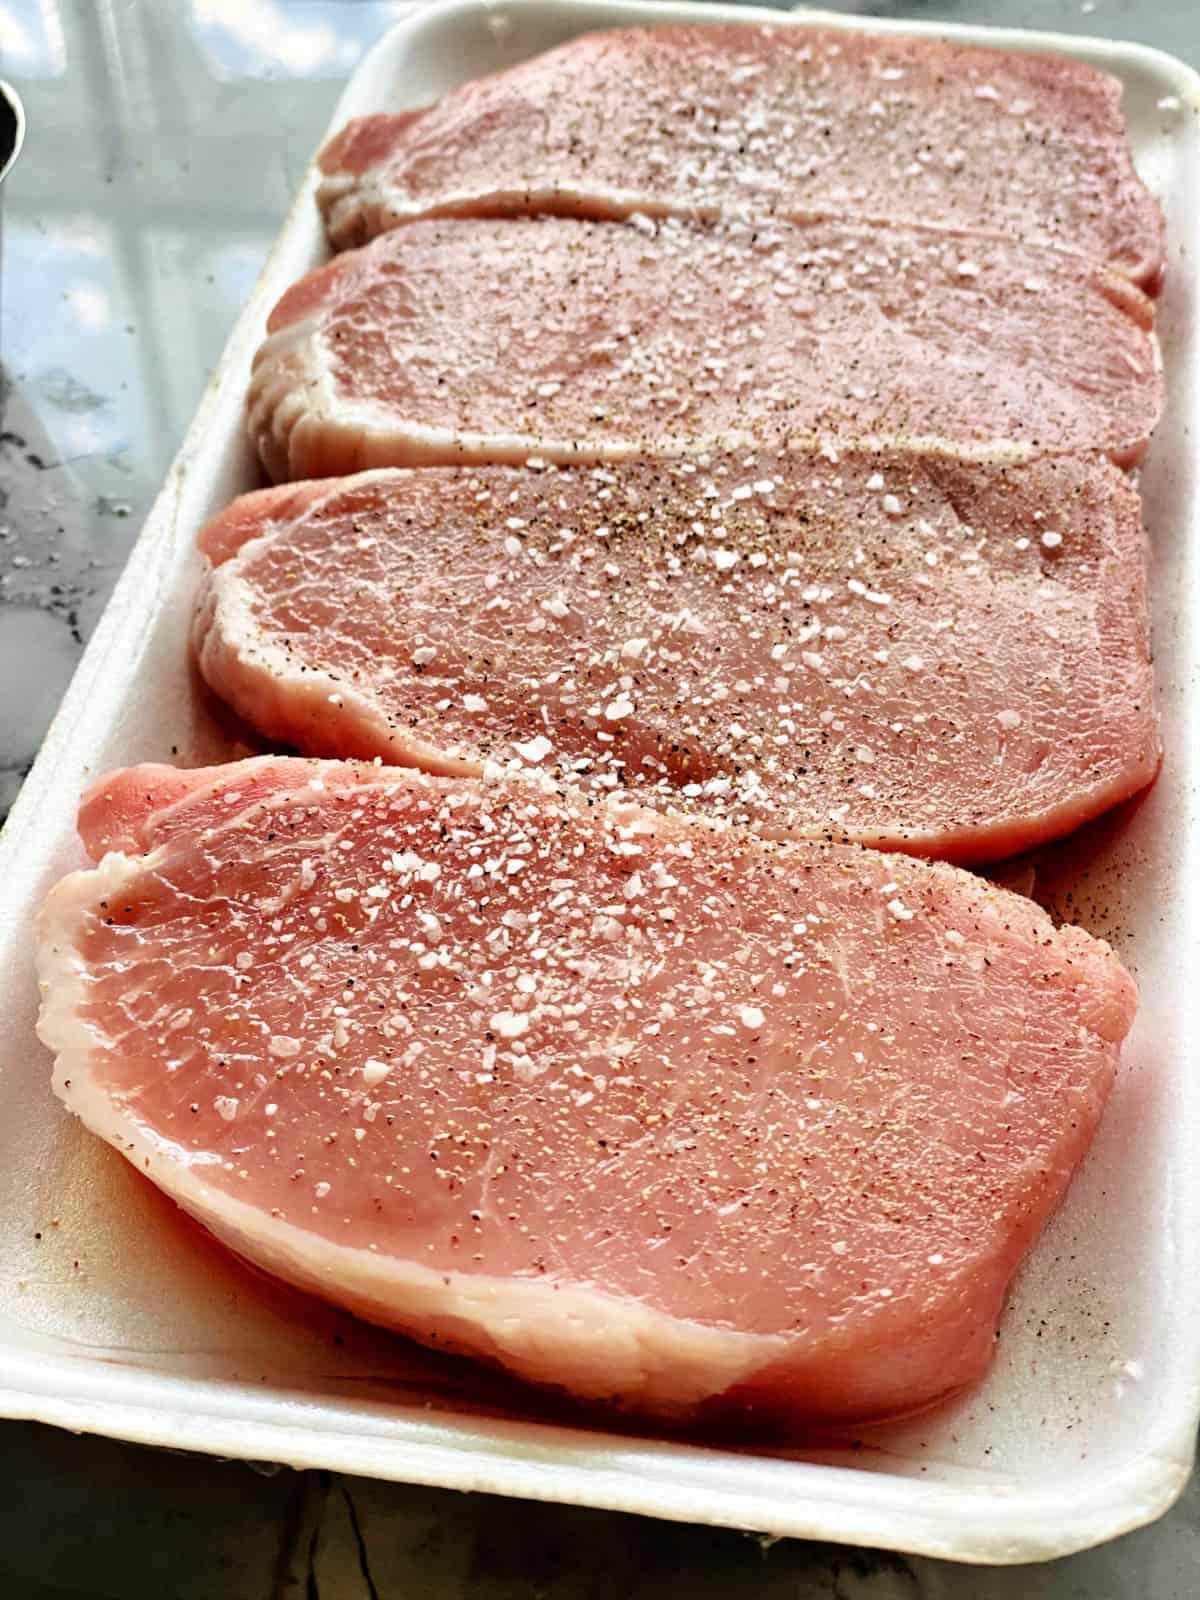 Four boneless porkchops seasoned on a white styrofoam tray.